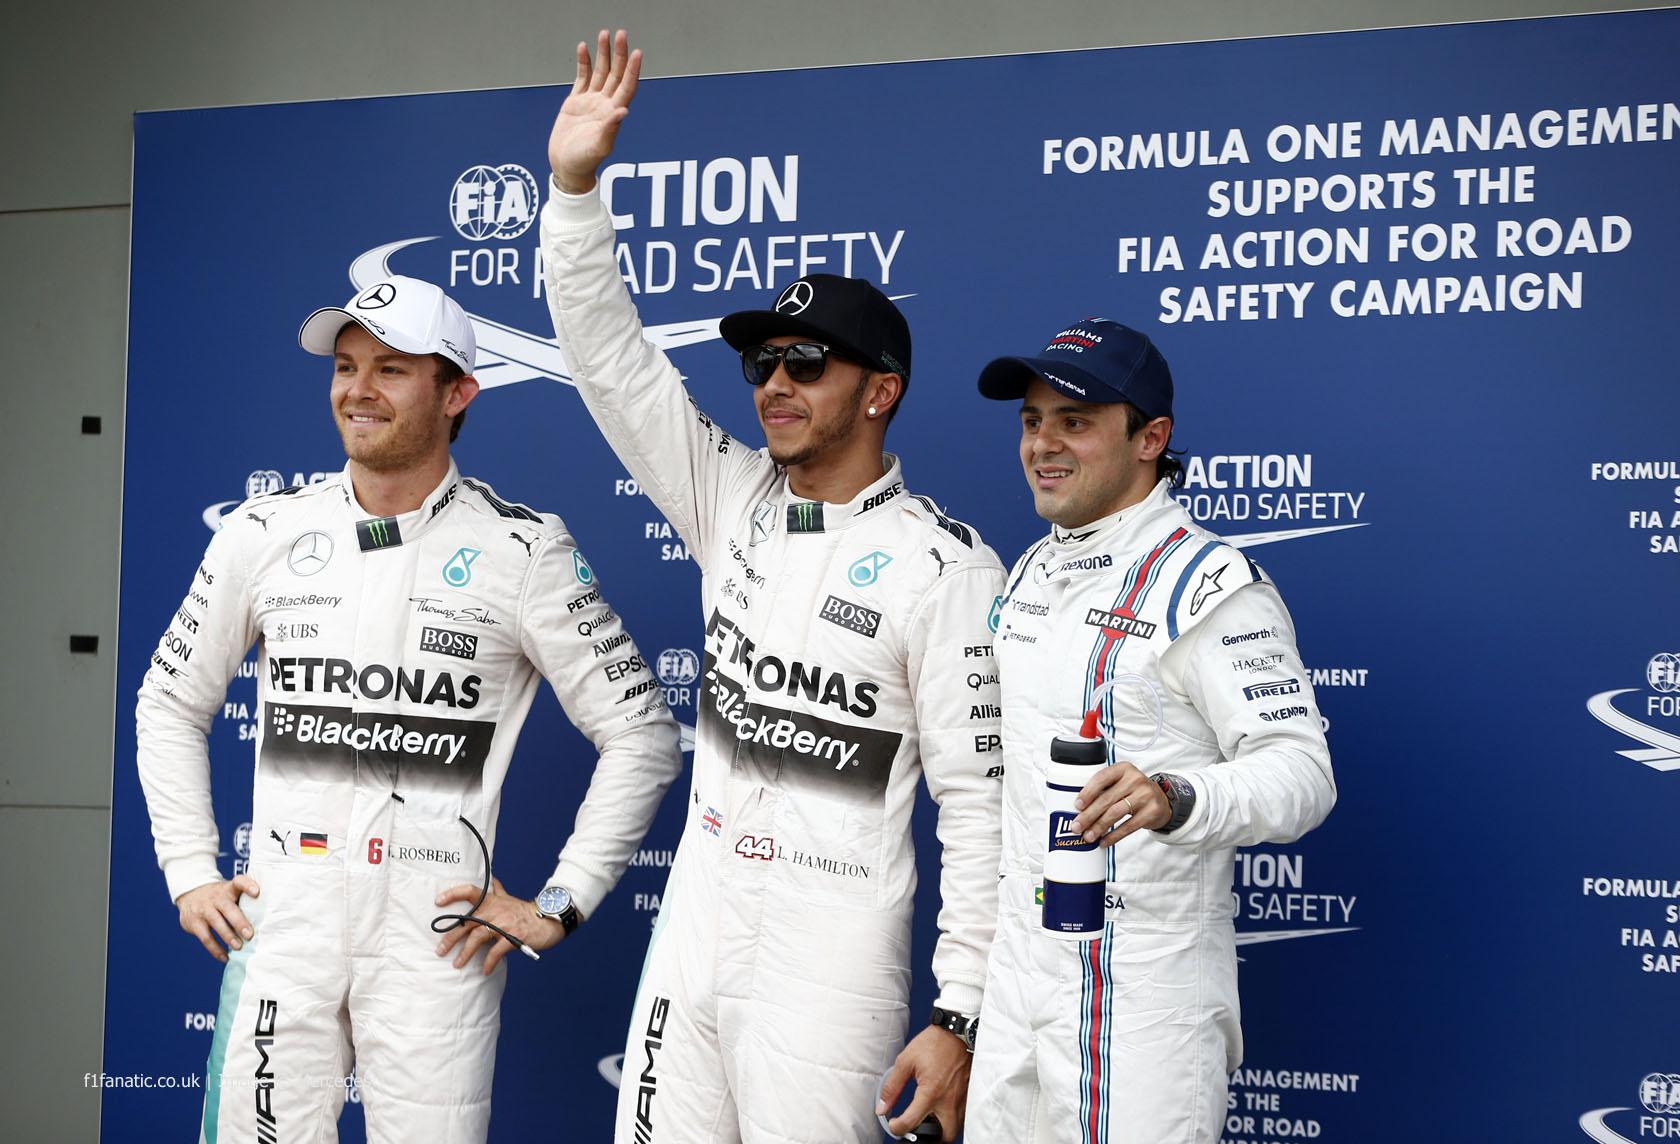 Nico Rosberg, Lewis Hamilton, Felipe Massa, Albert Park, 2015